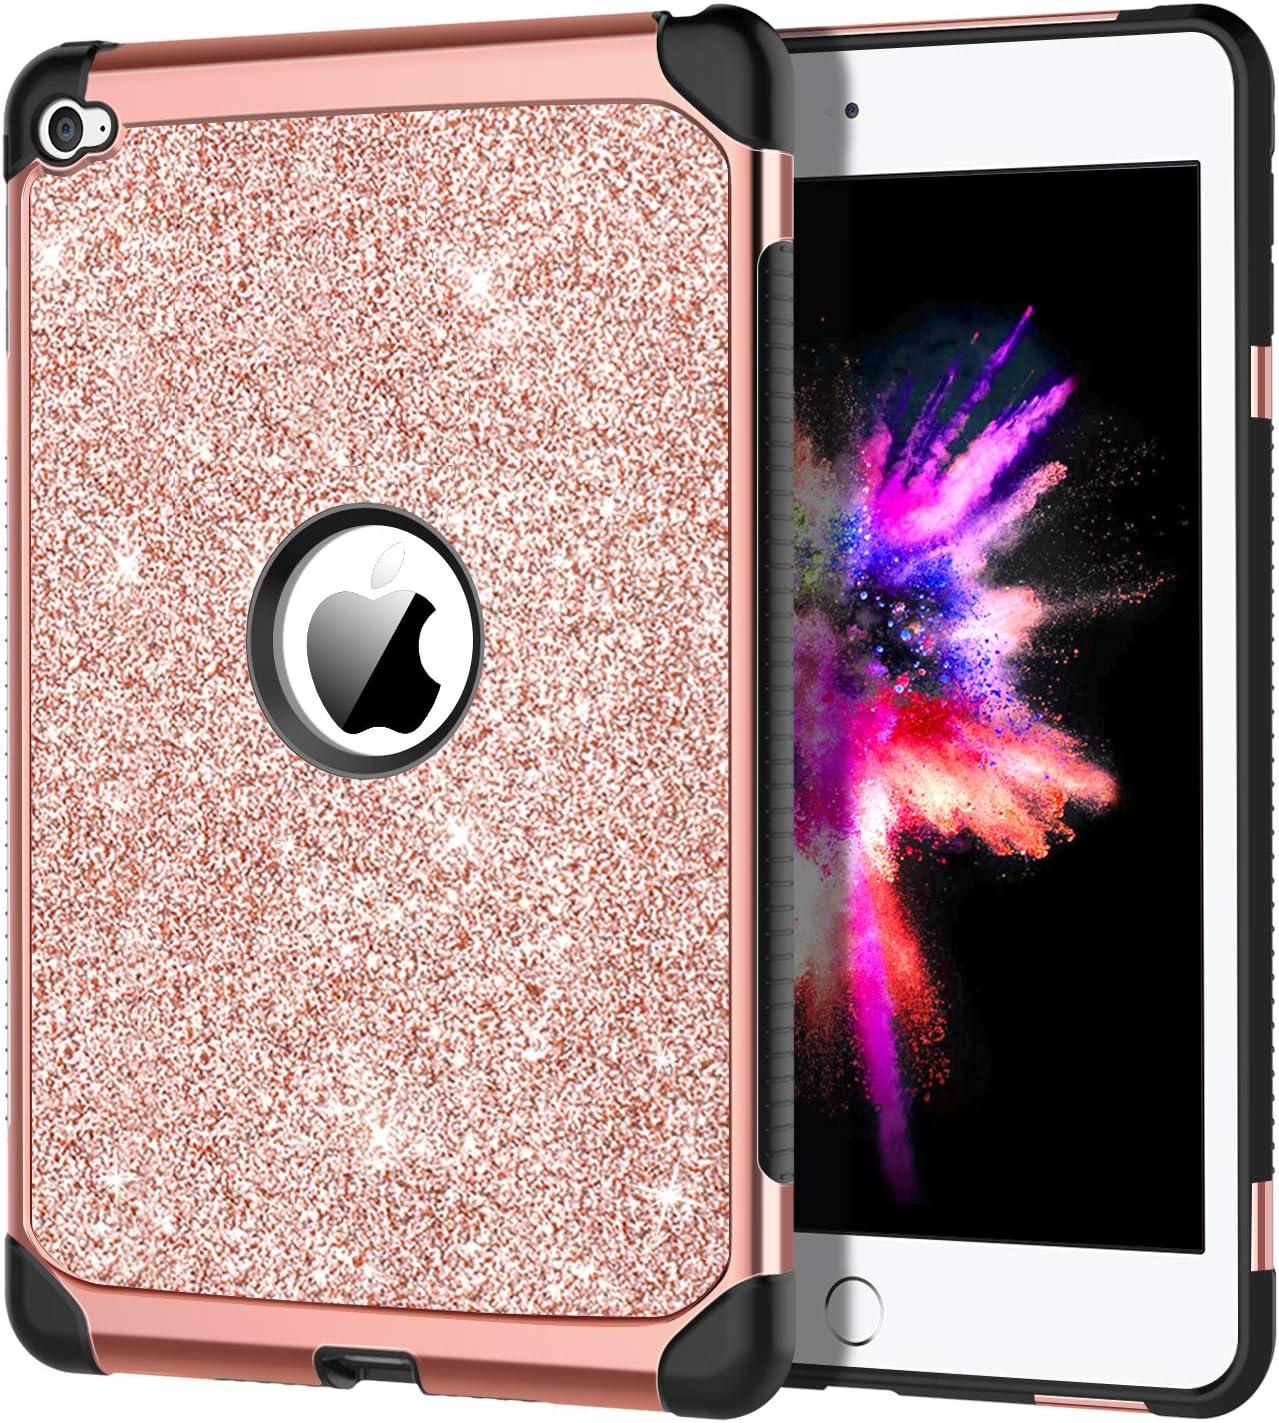 iPad Mini 4 Case, DOMAVER Luxury Glitter Shiny Girls Women Rose Gold iPad Mini 4 Retina Cases Slim Dual Layer Heavy Duty Hard PC Soft TPU Bumper Shockproof Protective Cover for iPad Mini 4